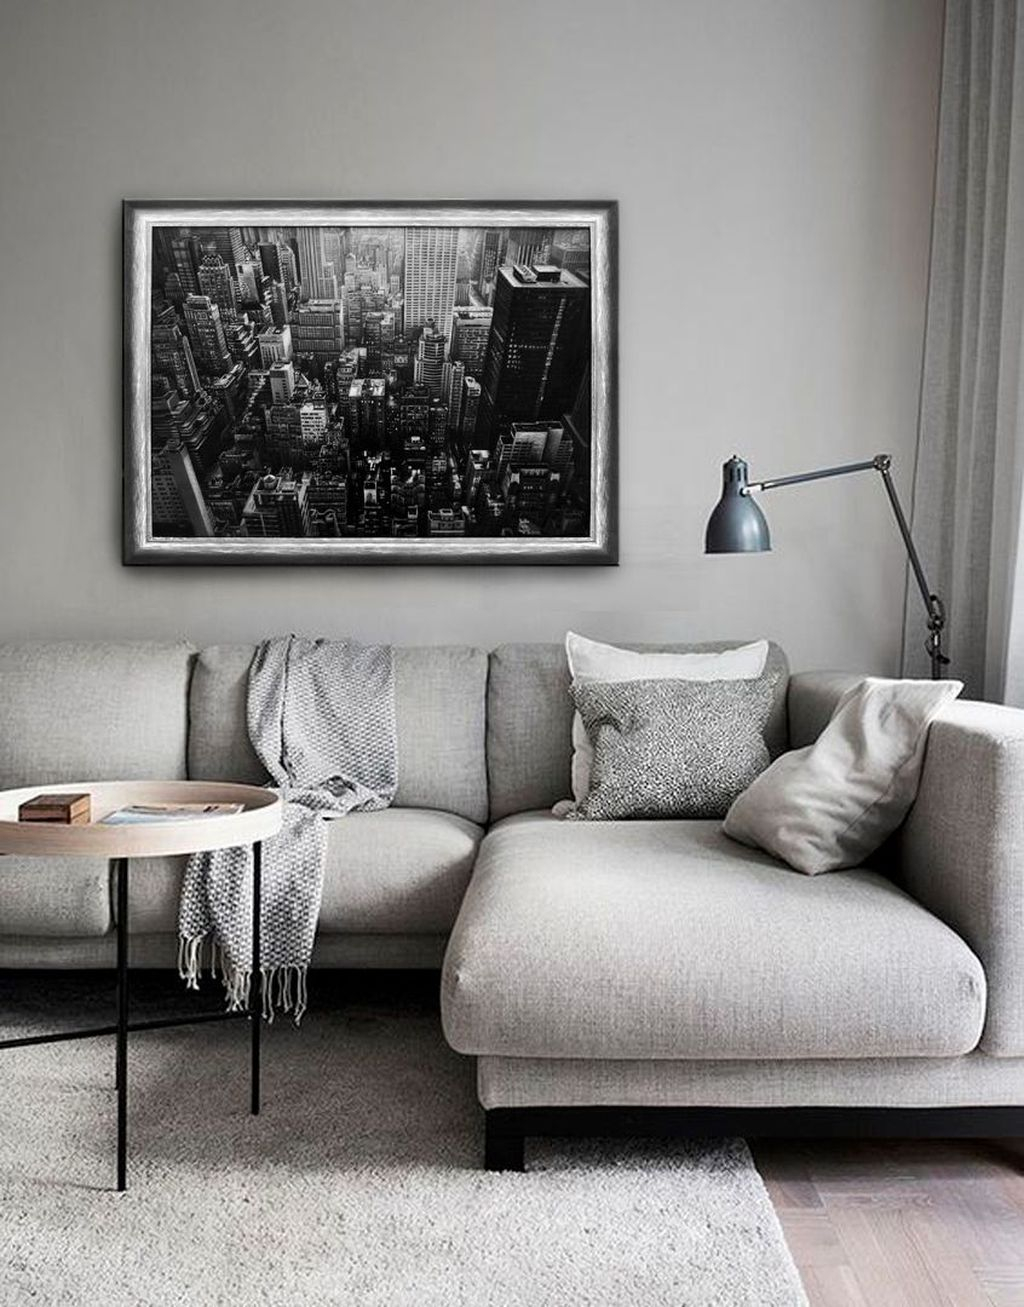 Enchanting Living Room Decor Ideas That Trending This Winter 10